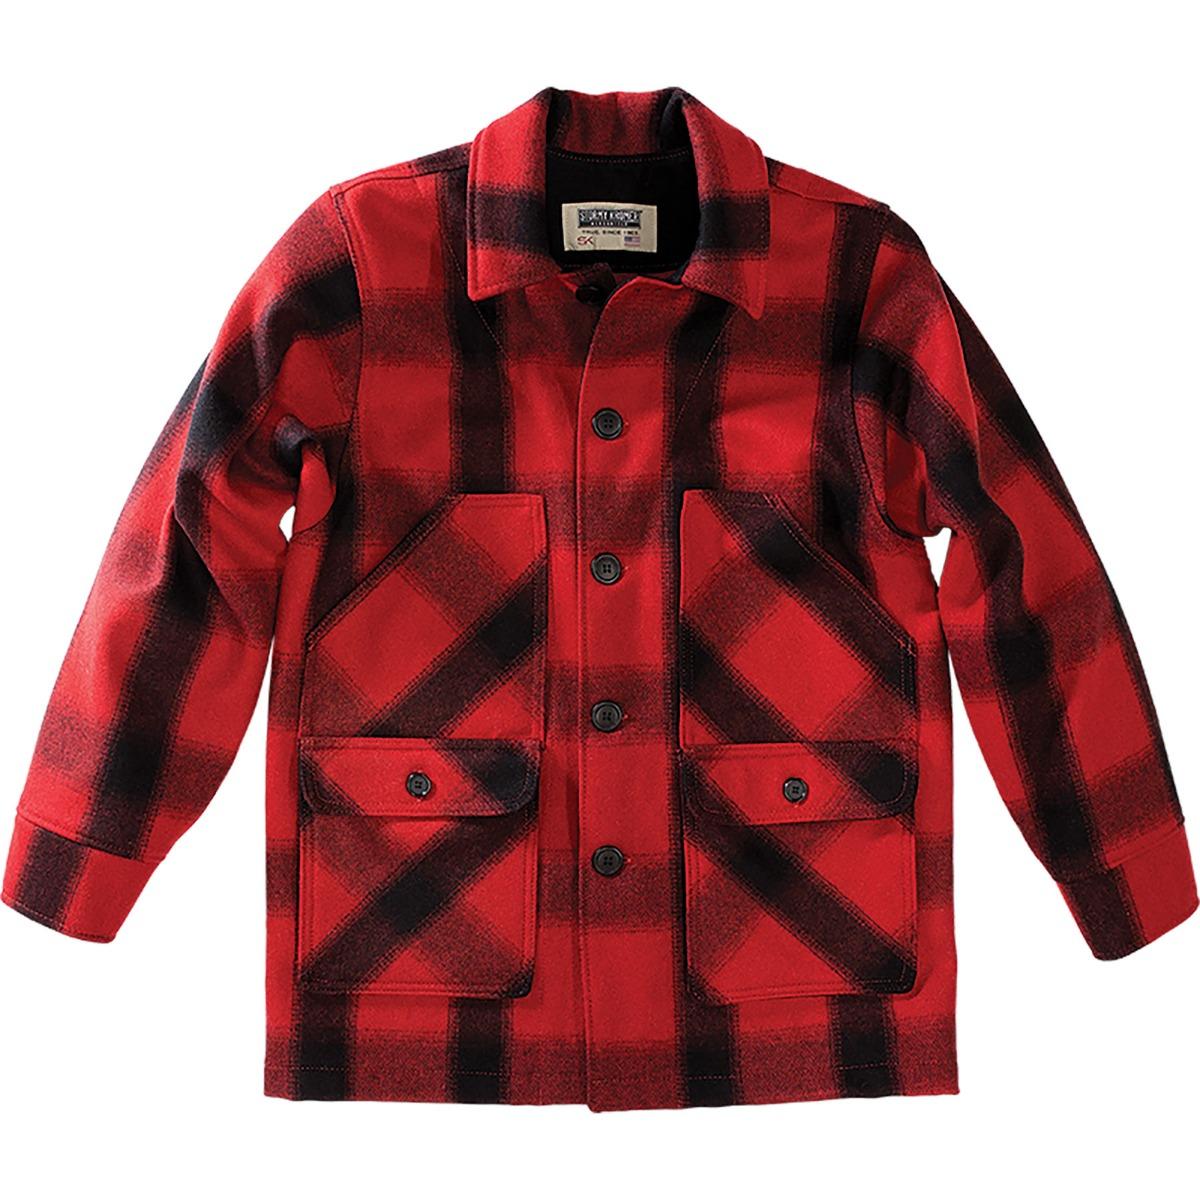 1920s Mens Coats & Jackets History Mackinaw Coat $289.99 AT vintagedancer.com